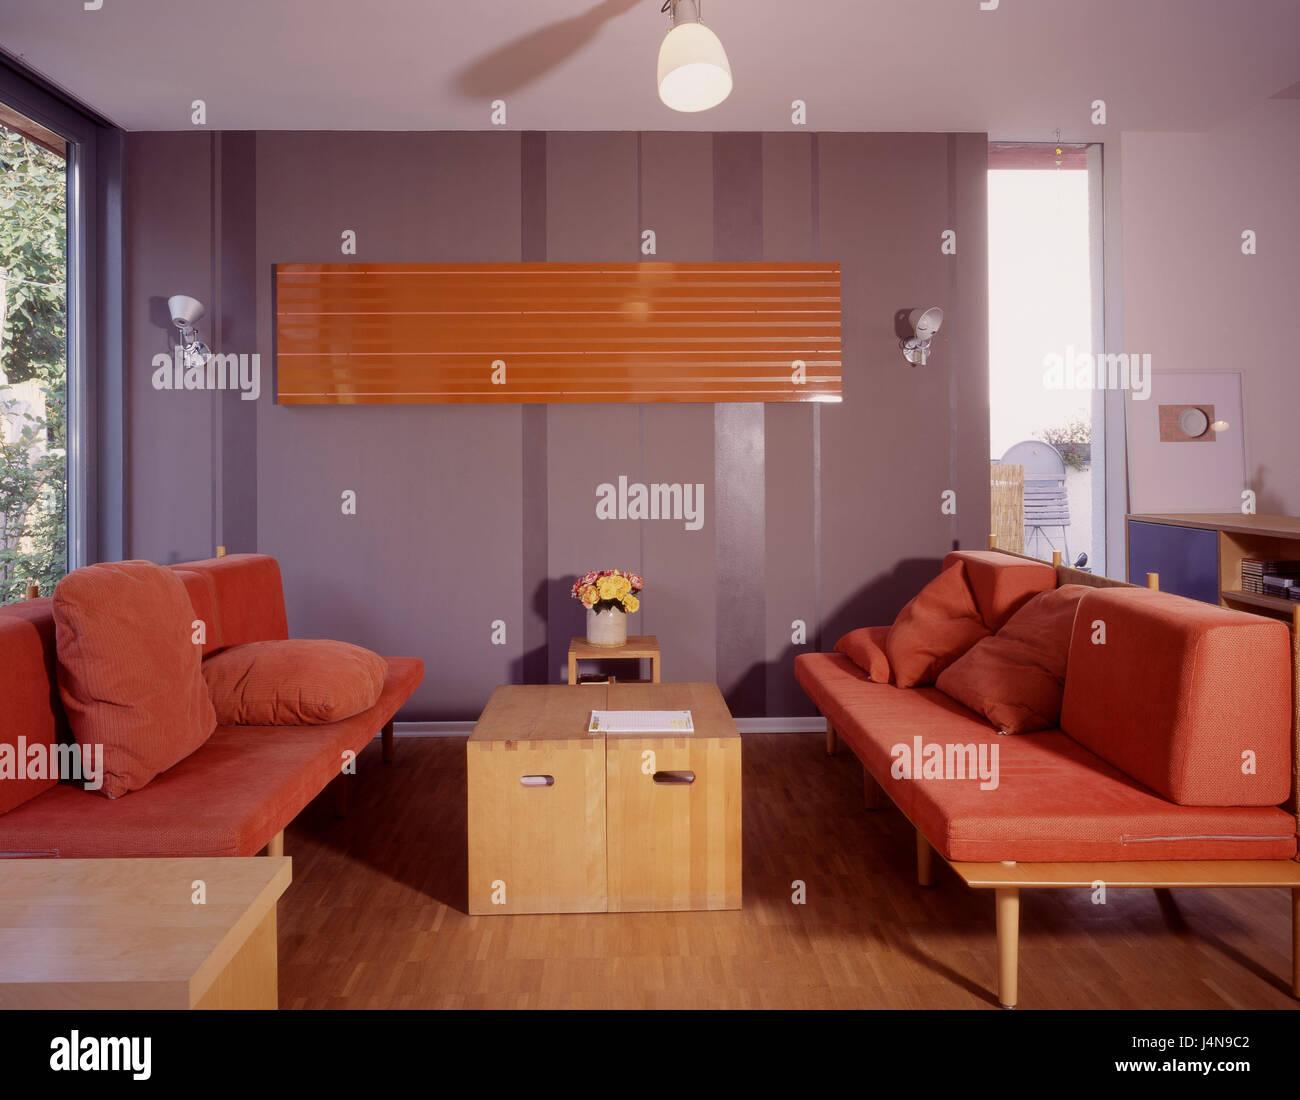 Aufenthaltsräume, Inneneinrichtung, modernen, lebendigen Platz ...